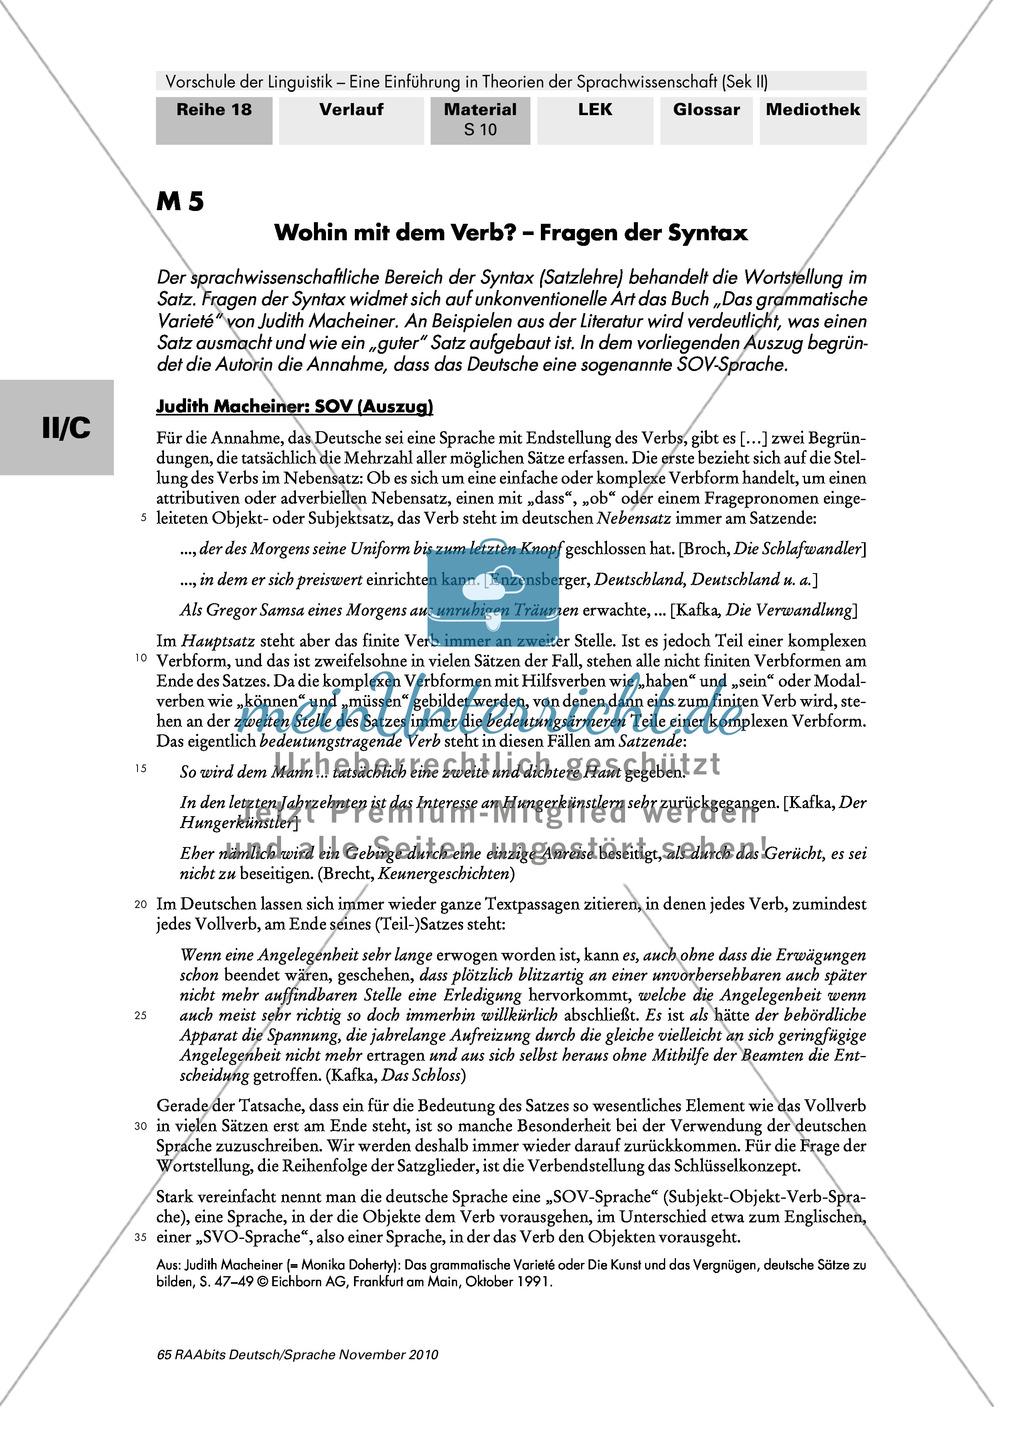 Tolle Mathe Arbeitsblatt Für Klasse 1 Wort Probleme Ideen - Mathe ...